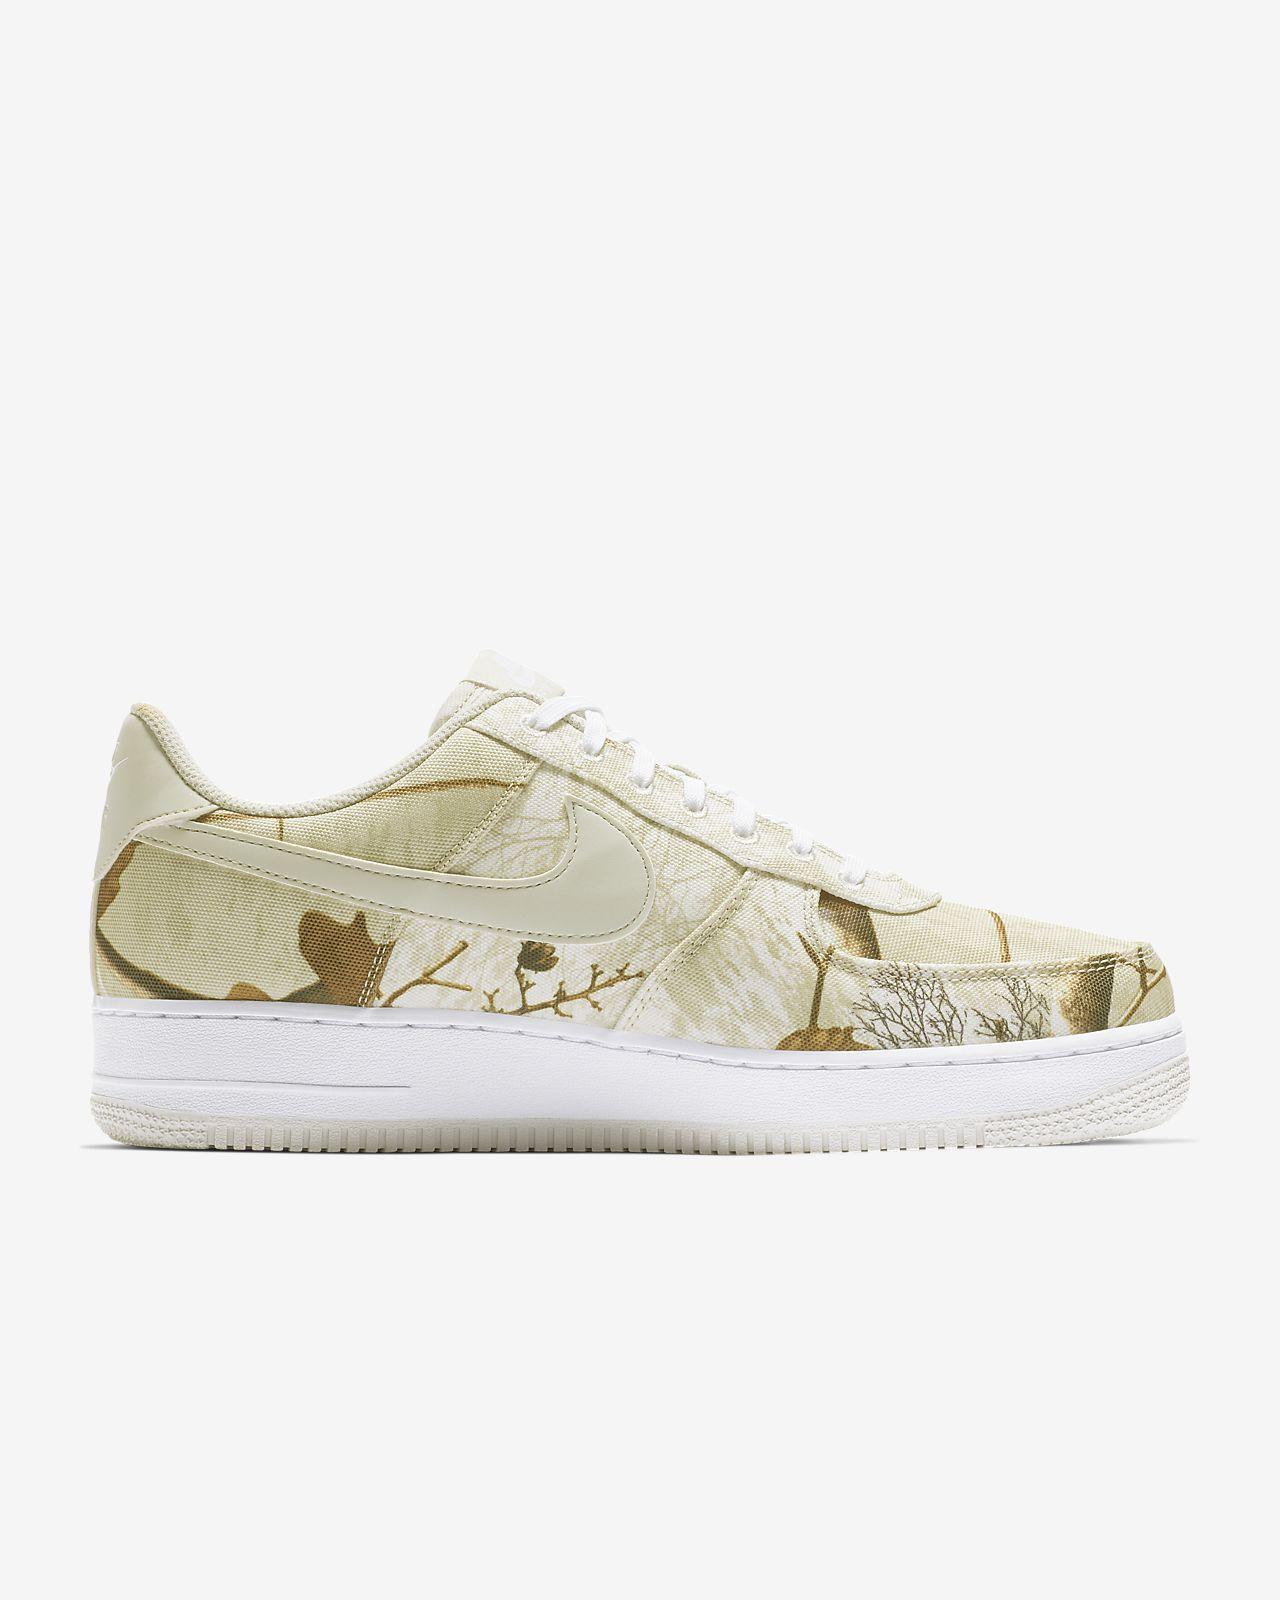 ab1c6d75ccab2 Nike Air Force 1 '07 LV8 3 Realtree® Men's Shoe. Nike.com GB